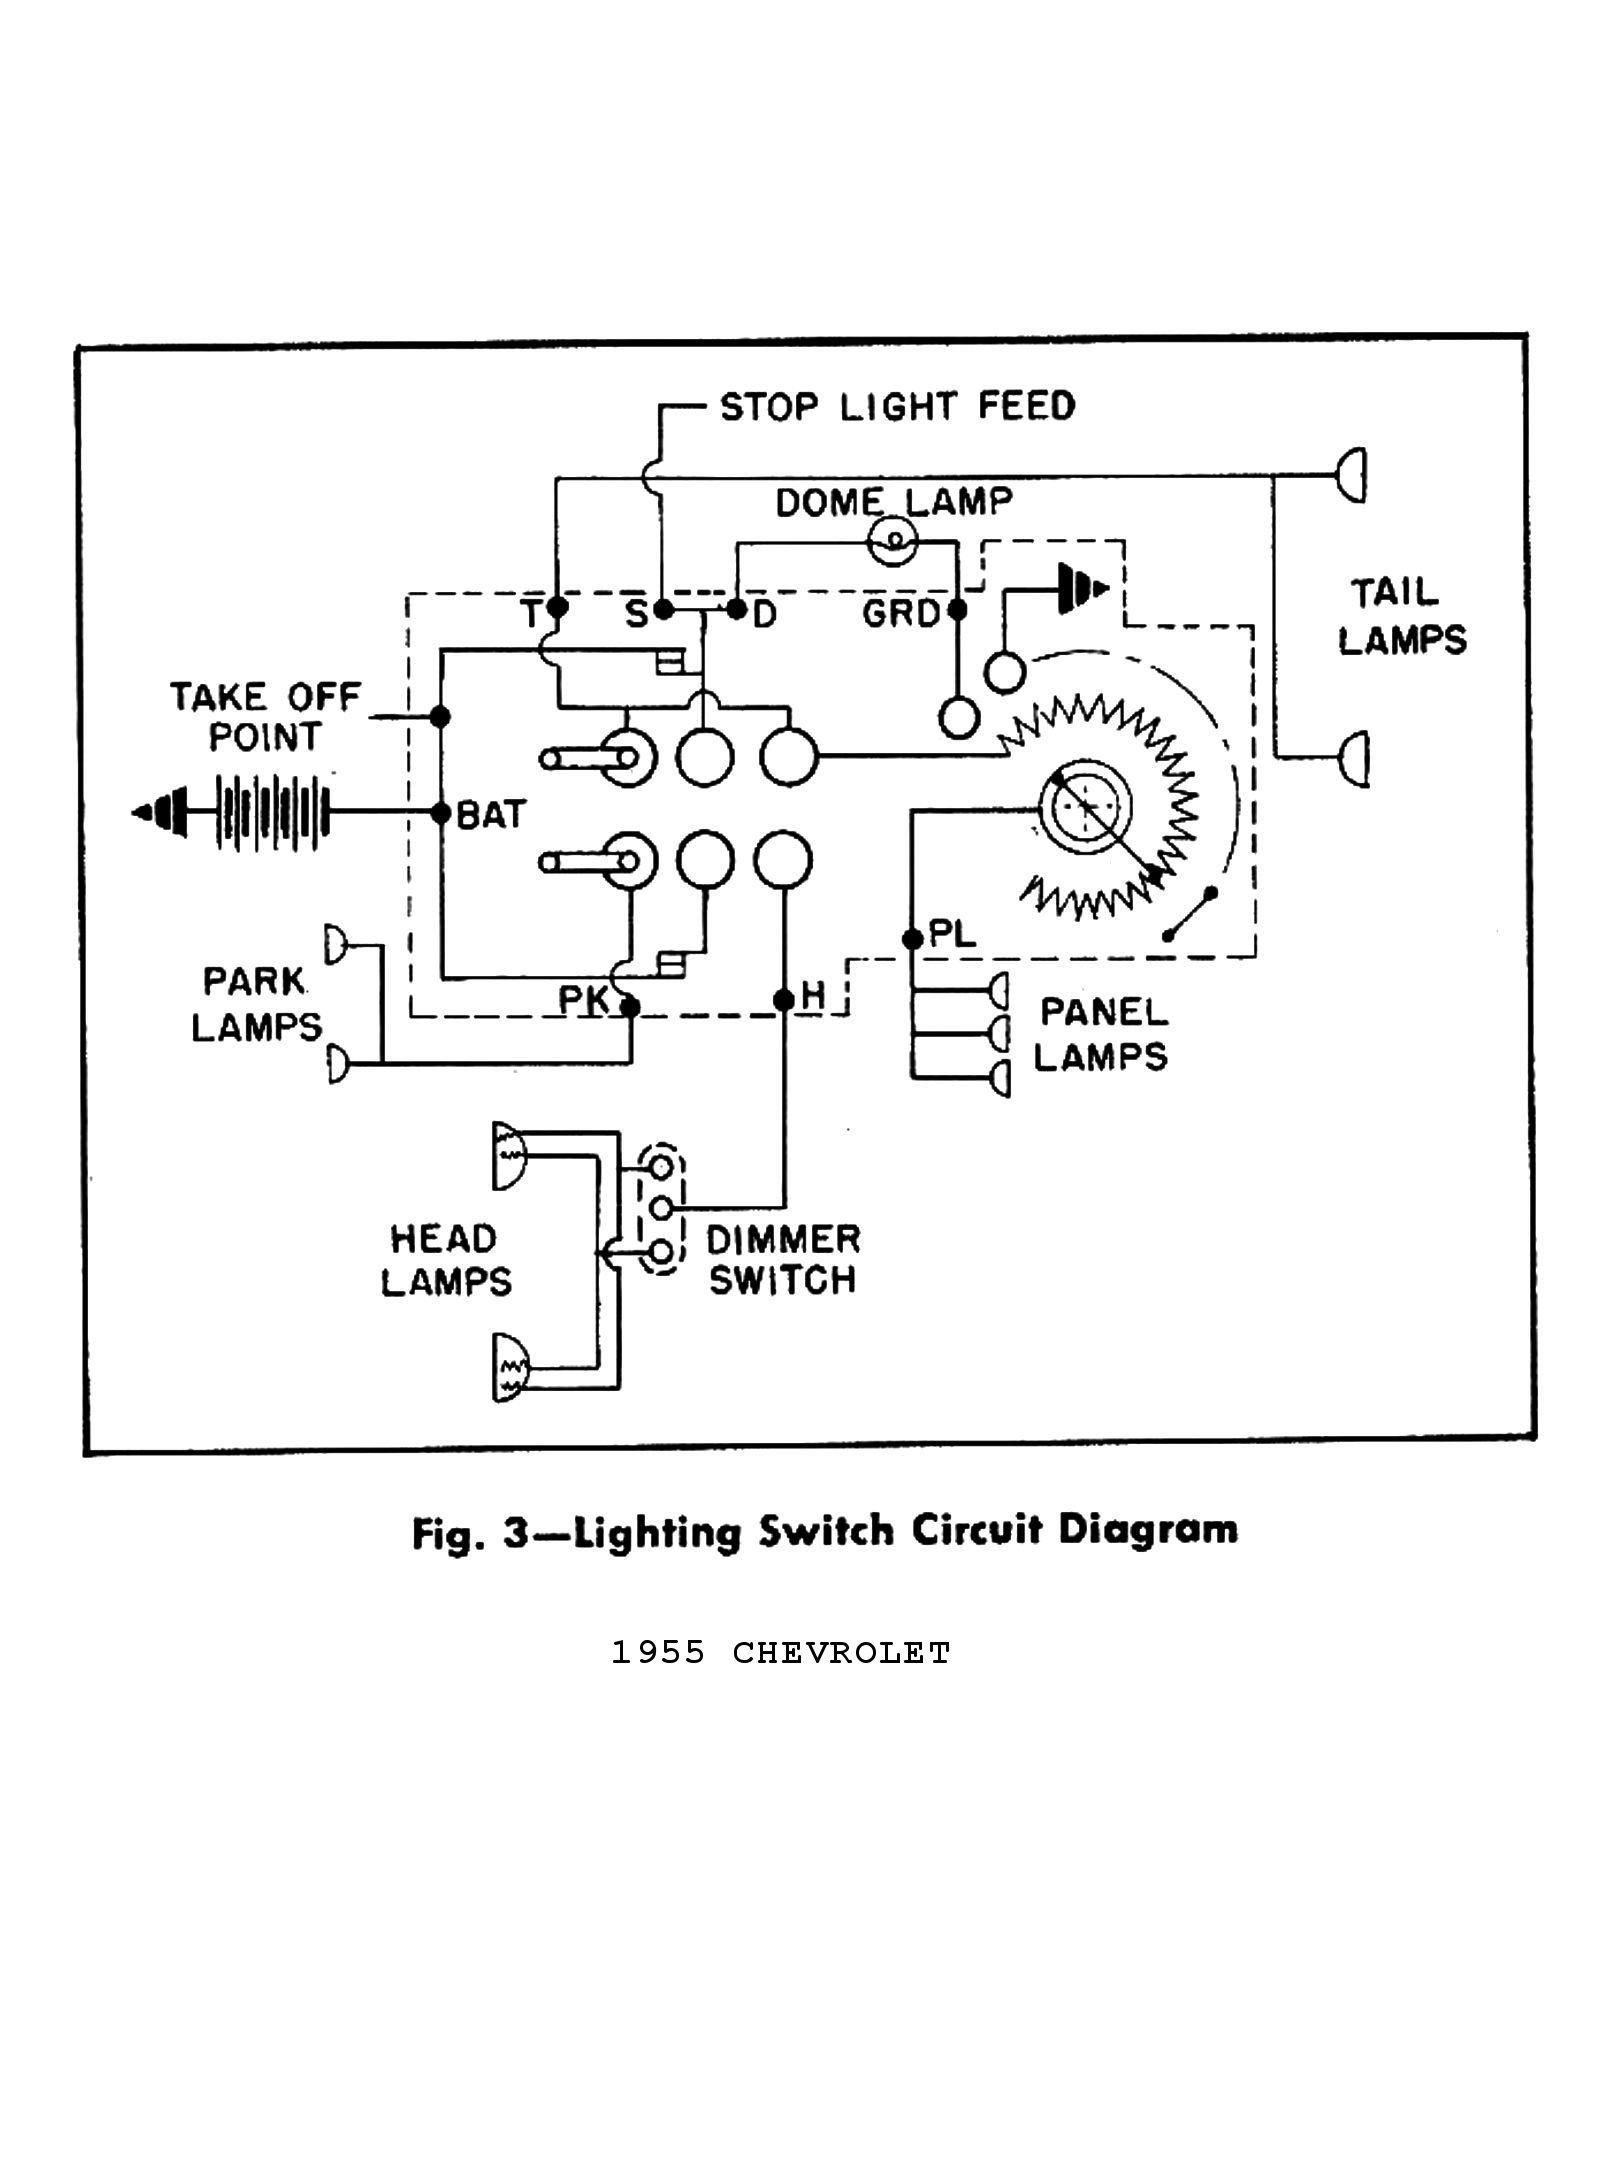 Gm Power Window 5 Pin Switch Wiring Diagram – Light Switch Wiring Schematic For Gm